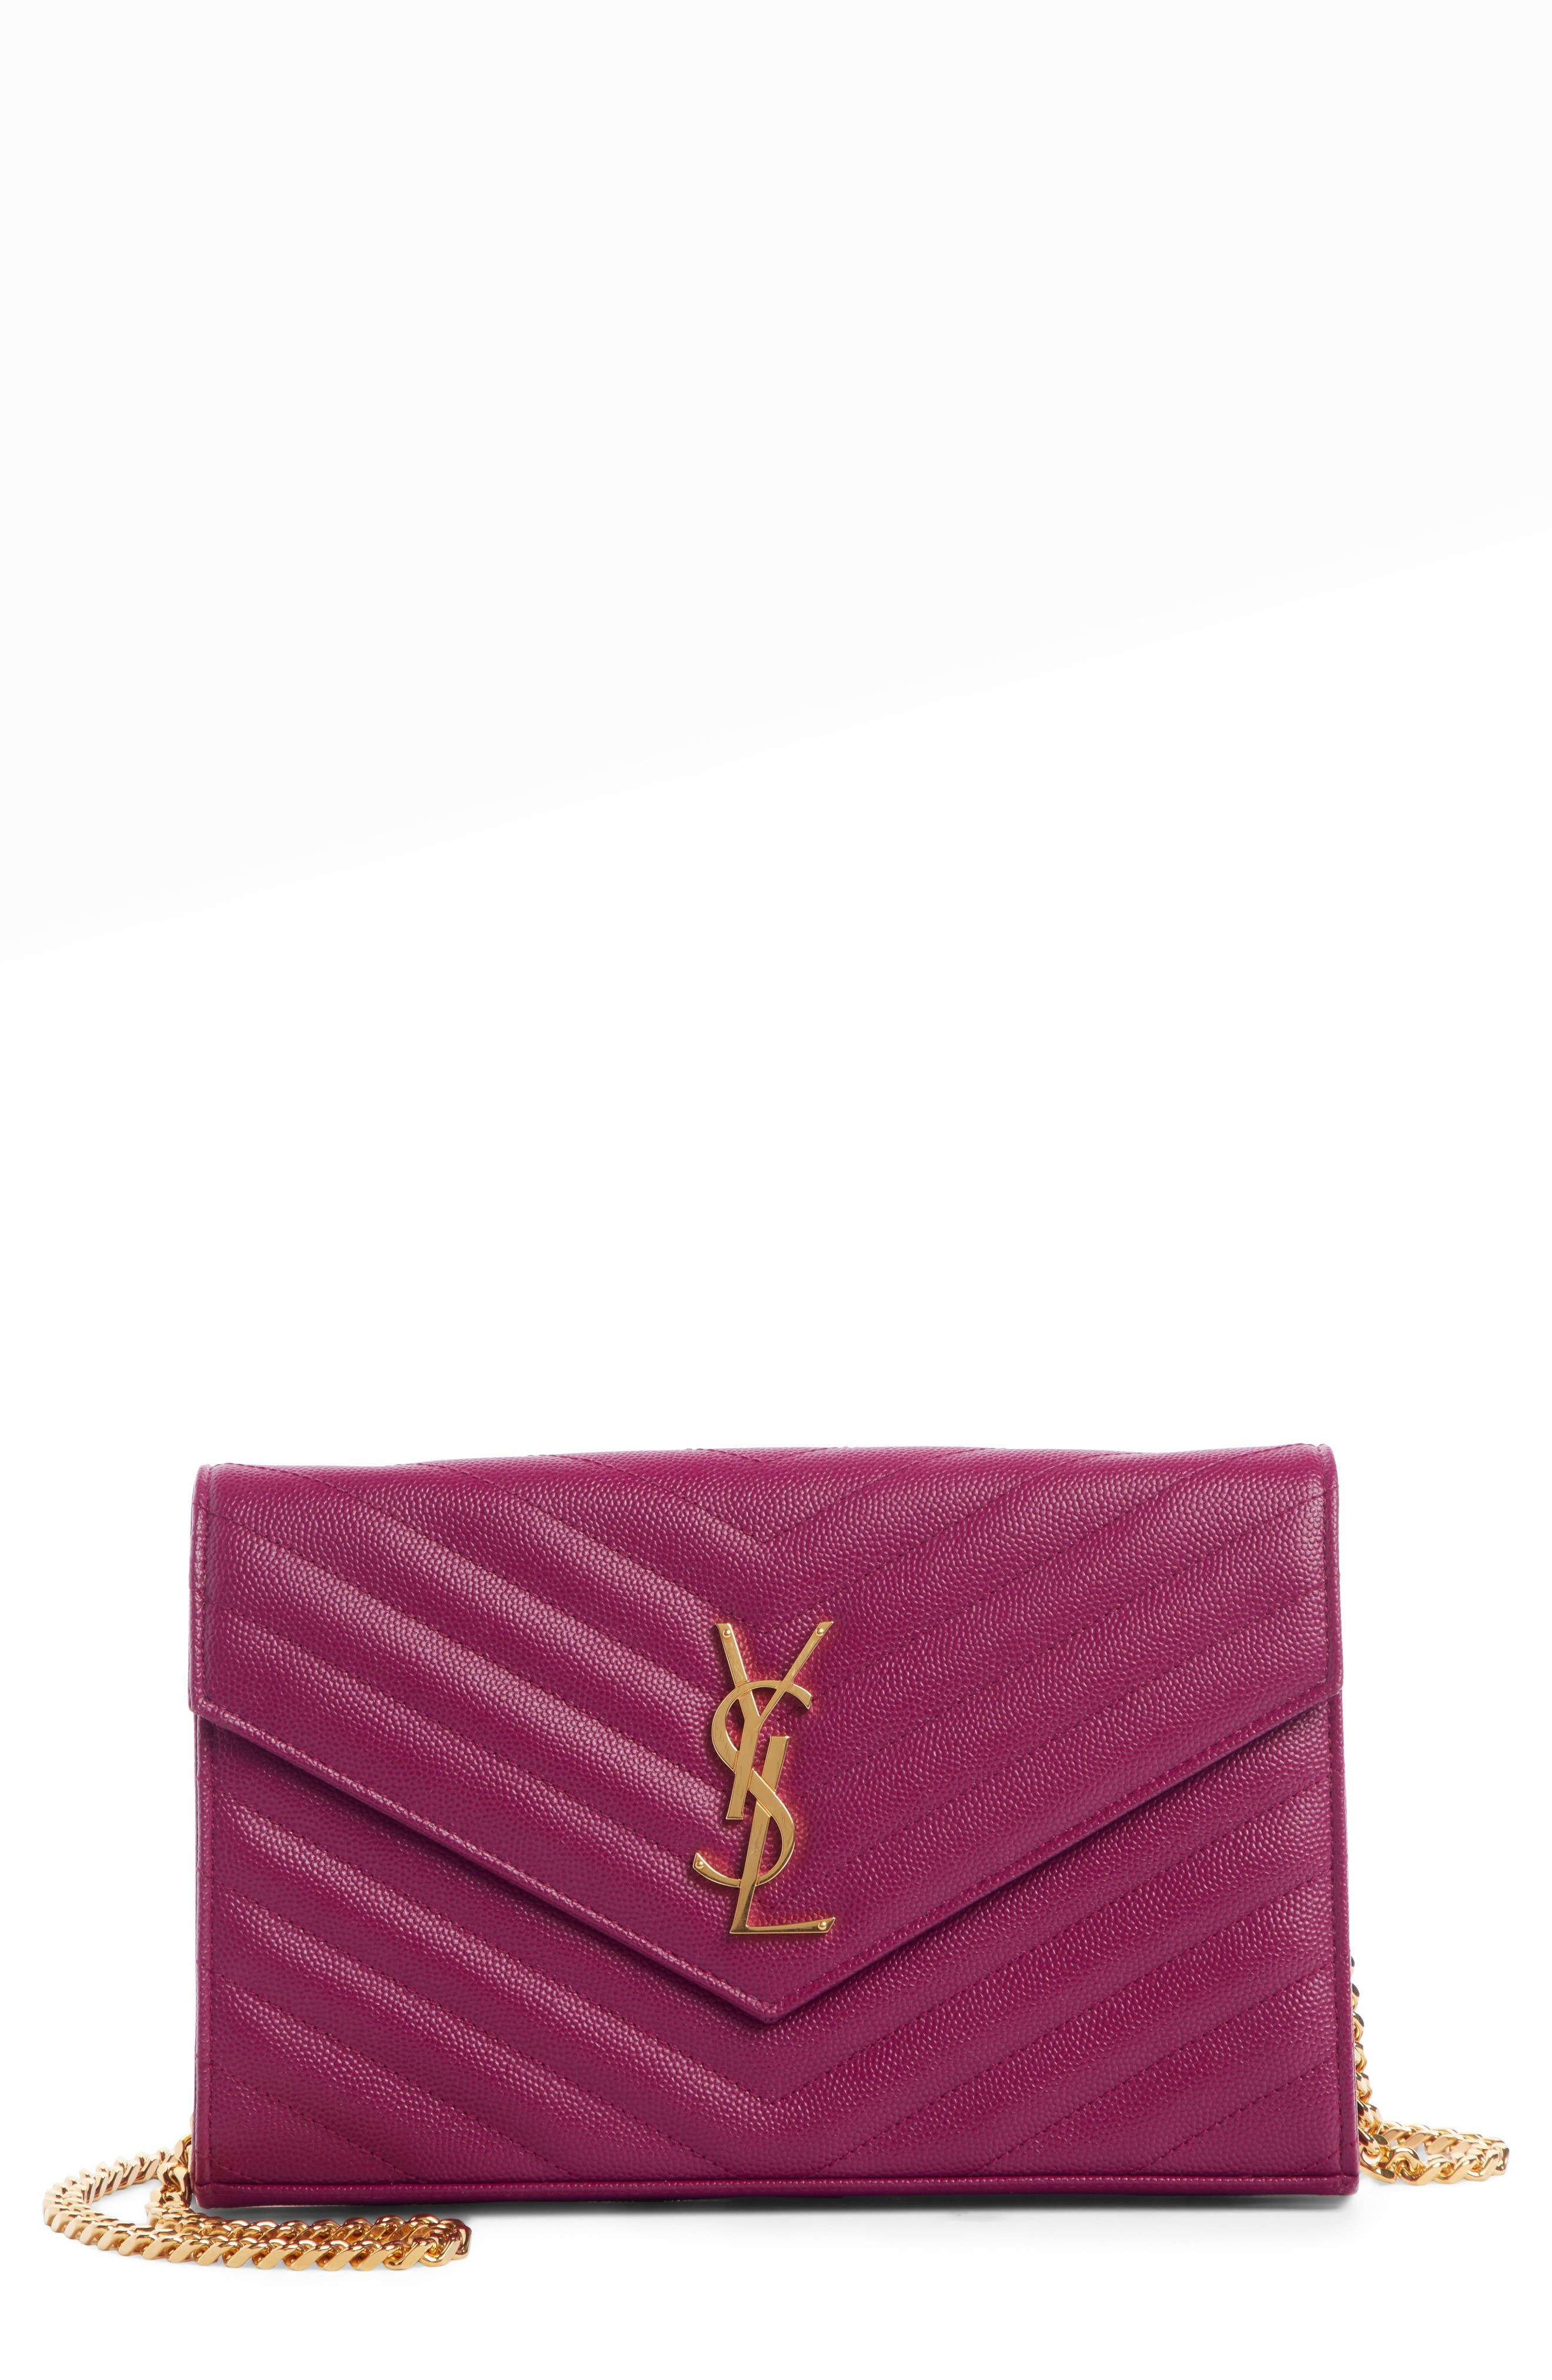 b0e8b2c4ba5413 Wallets & Card Cases for Women | Nordstrom